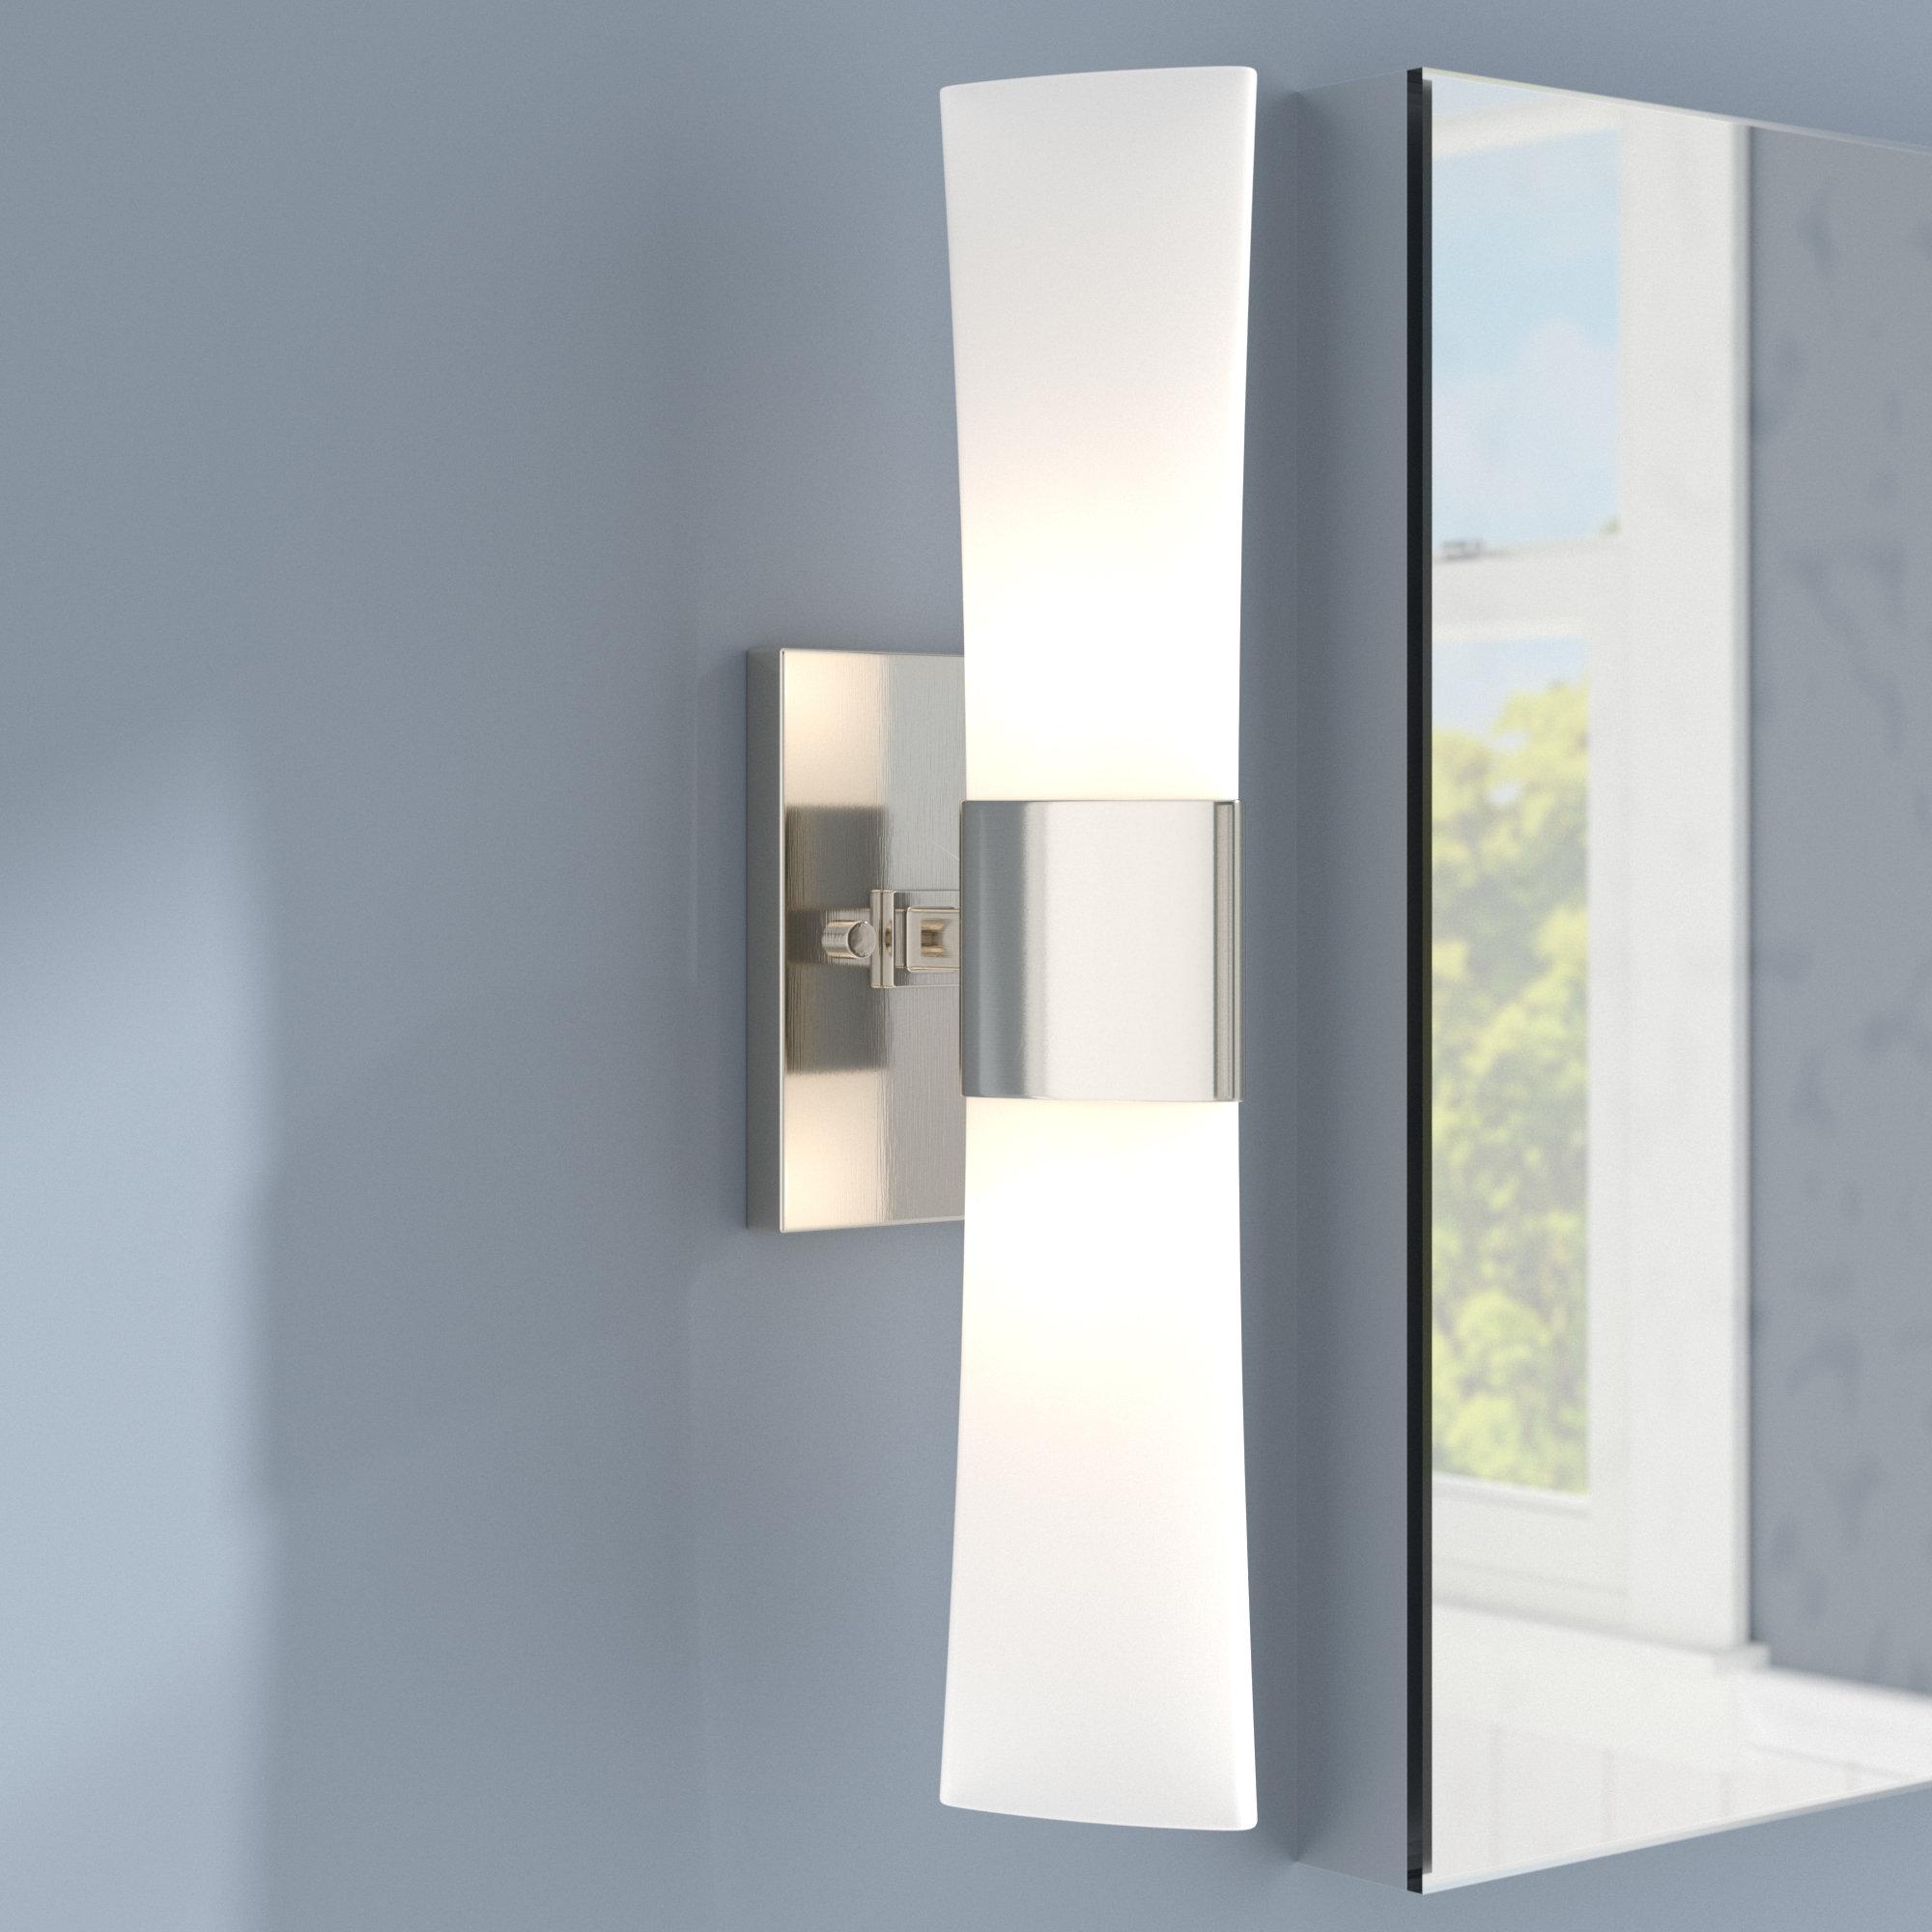 Ebern Designs Cheval 2-Light Bath Sconce & Reviews | Wayfair